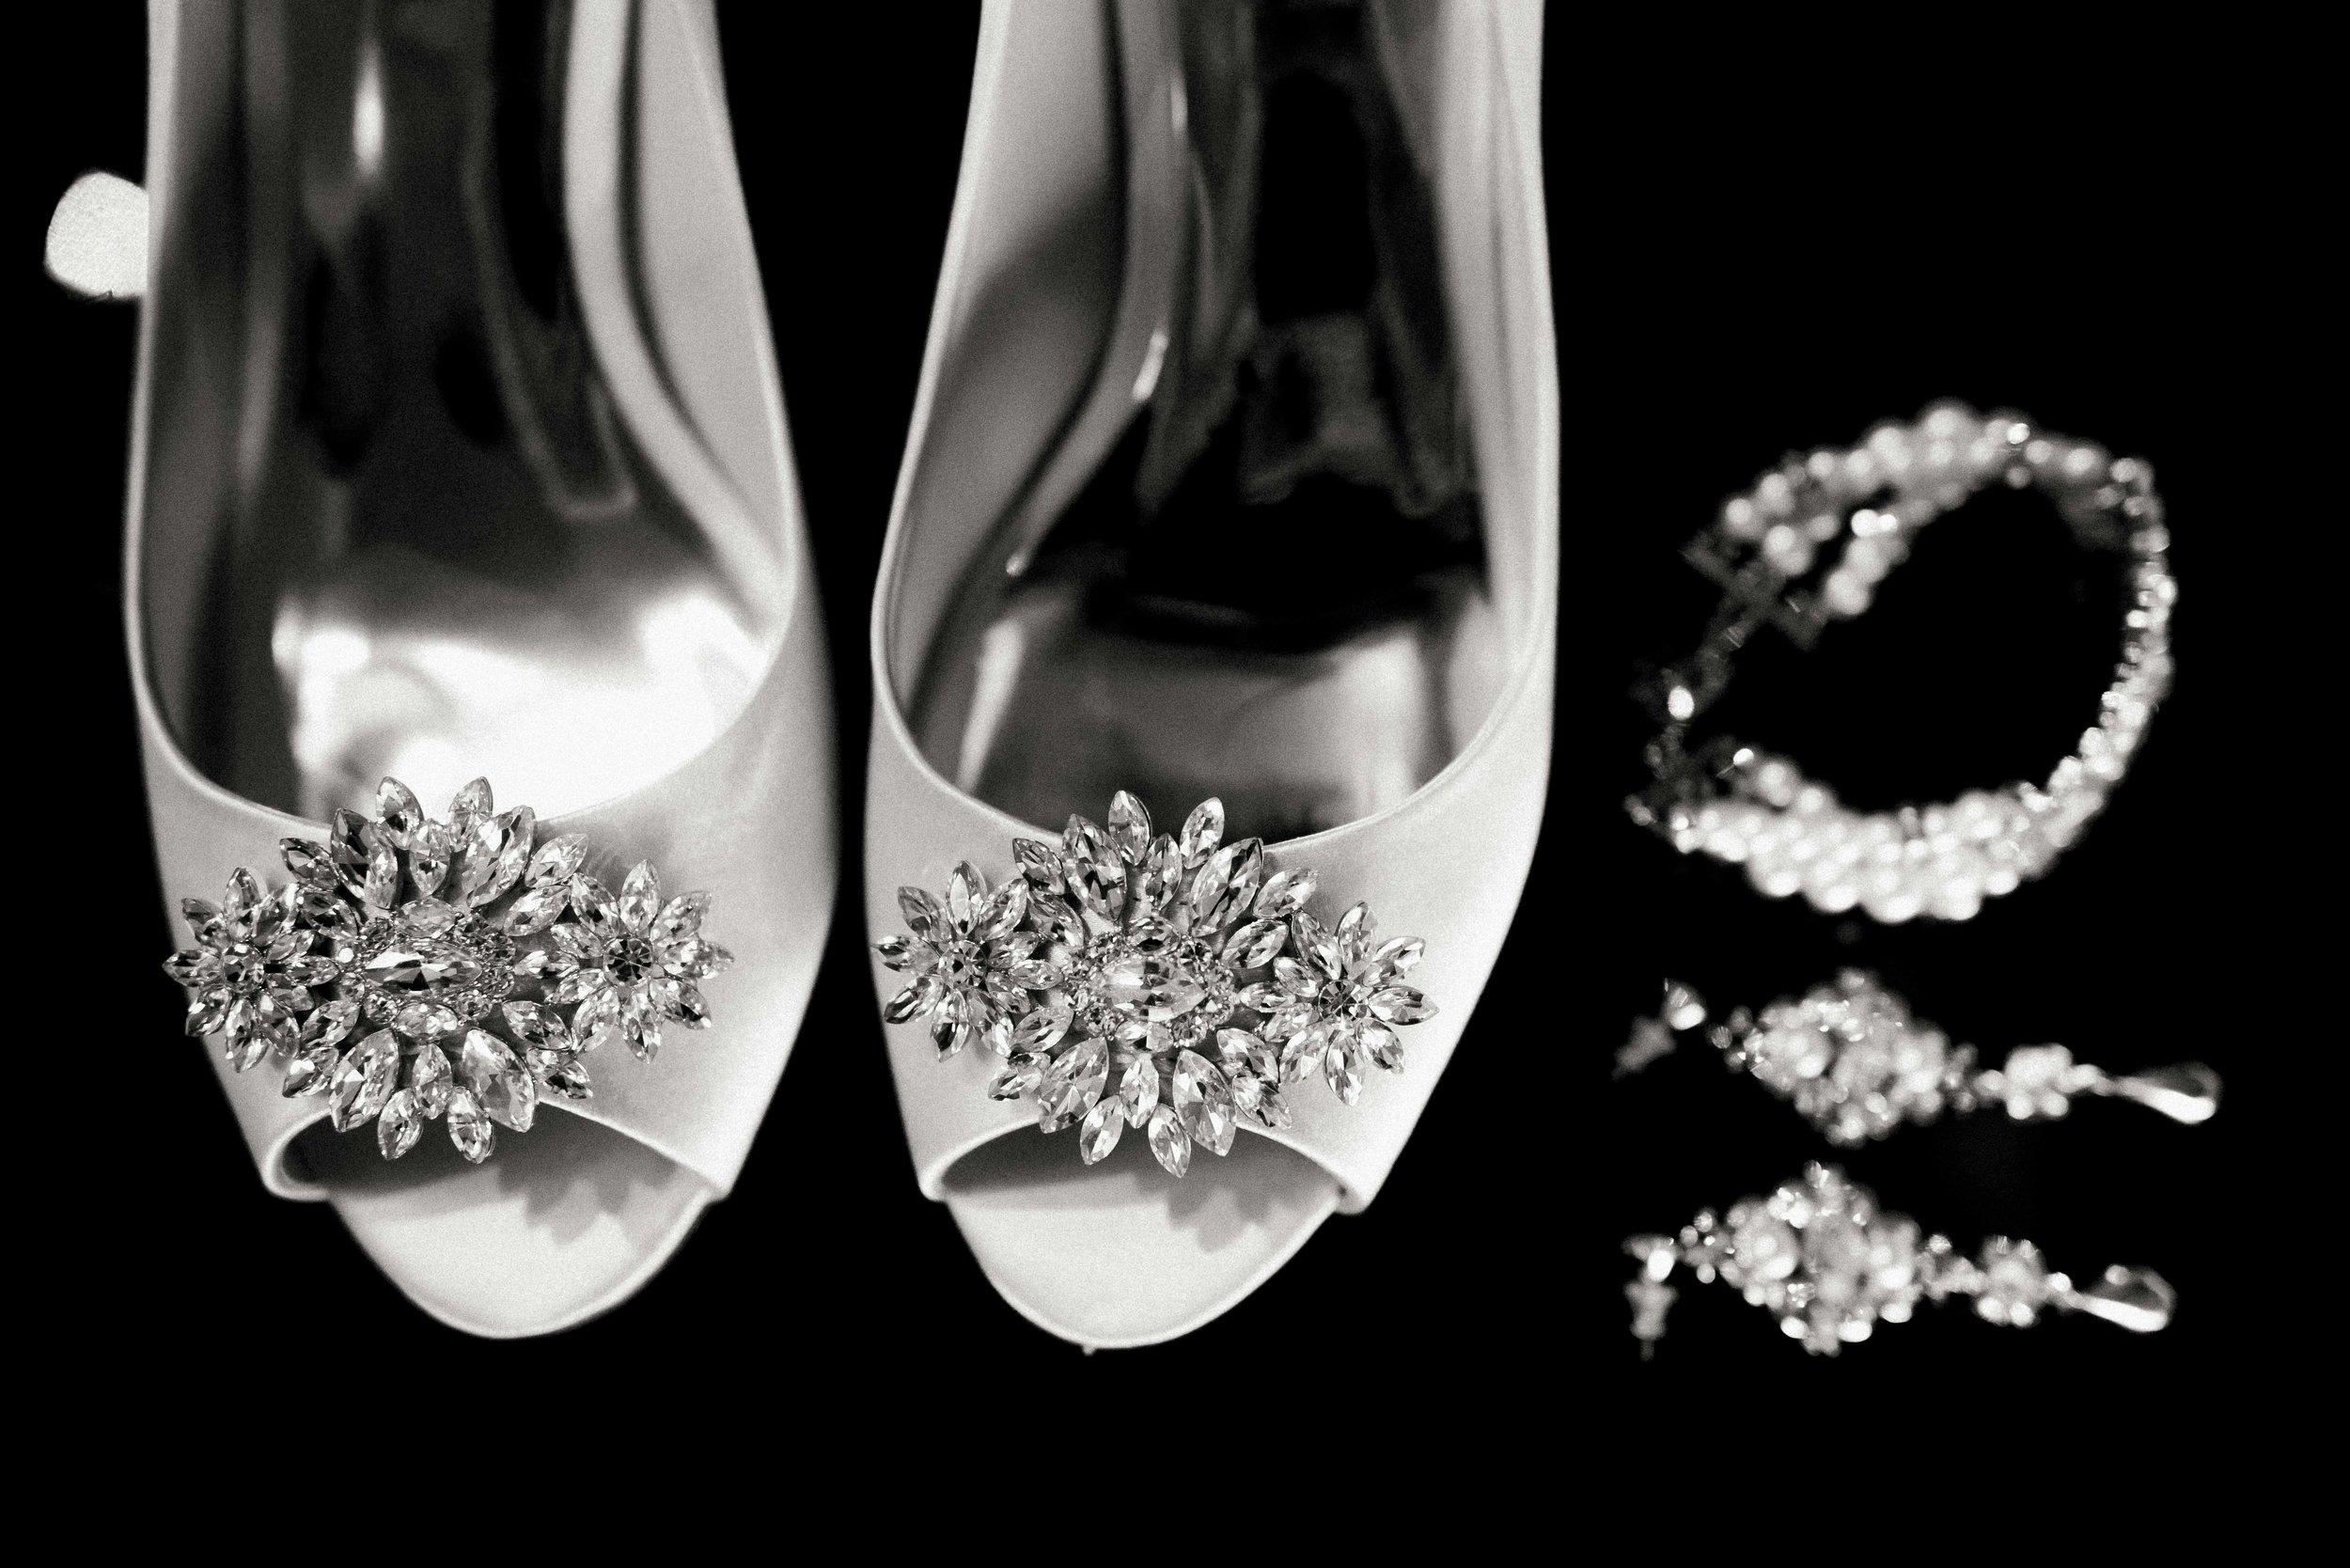 Minneapolis St Paul Twin Cities John Notman Wedding Engagement Best Candid Documentary Photography-3366.jpg